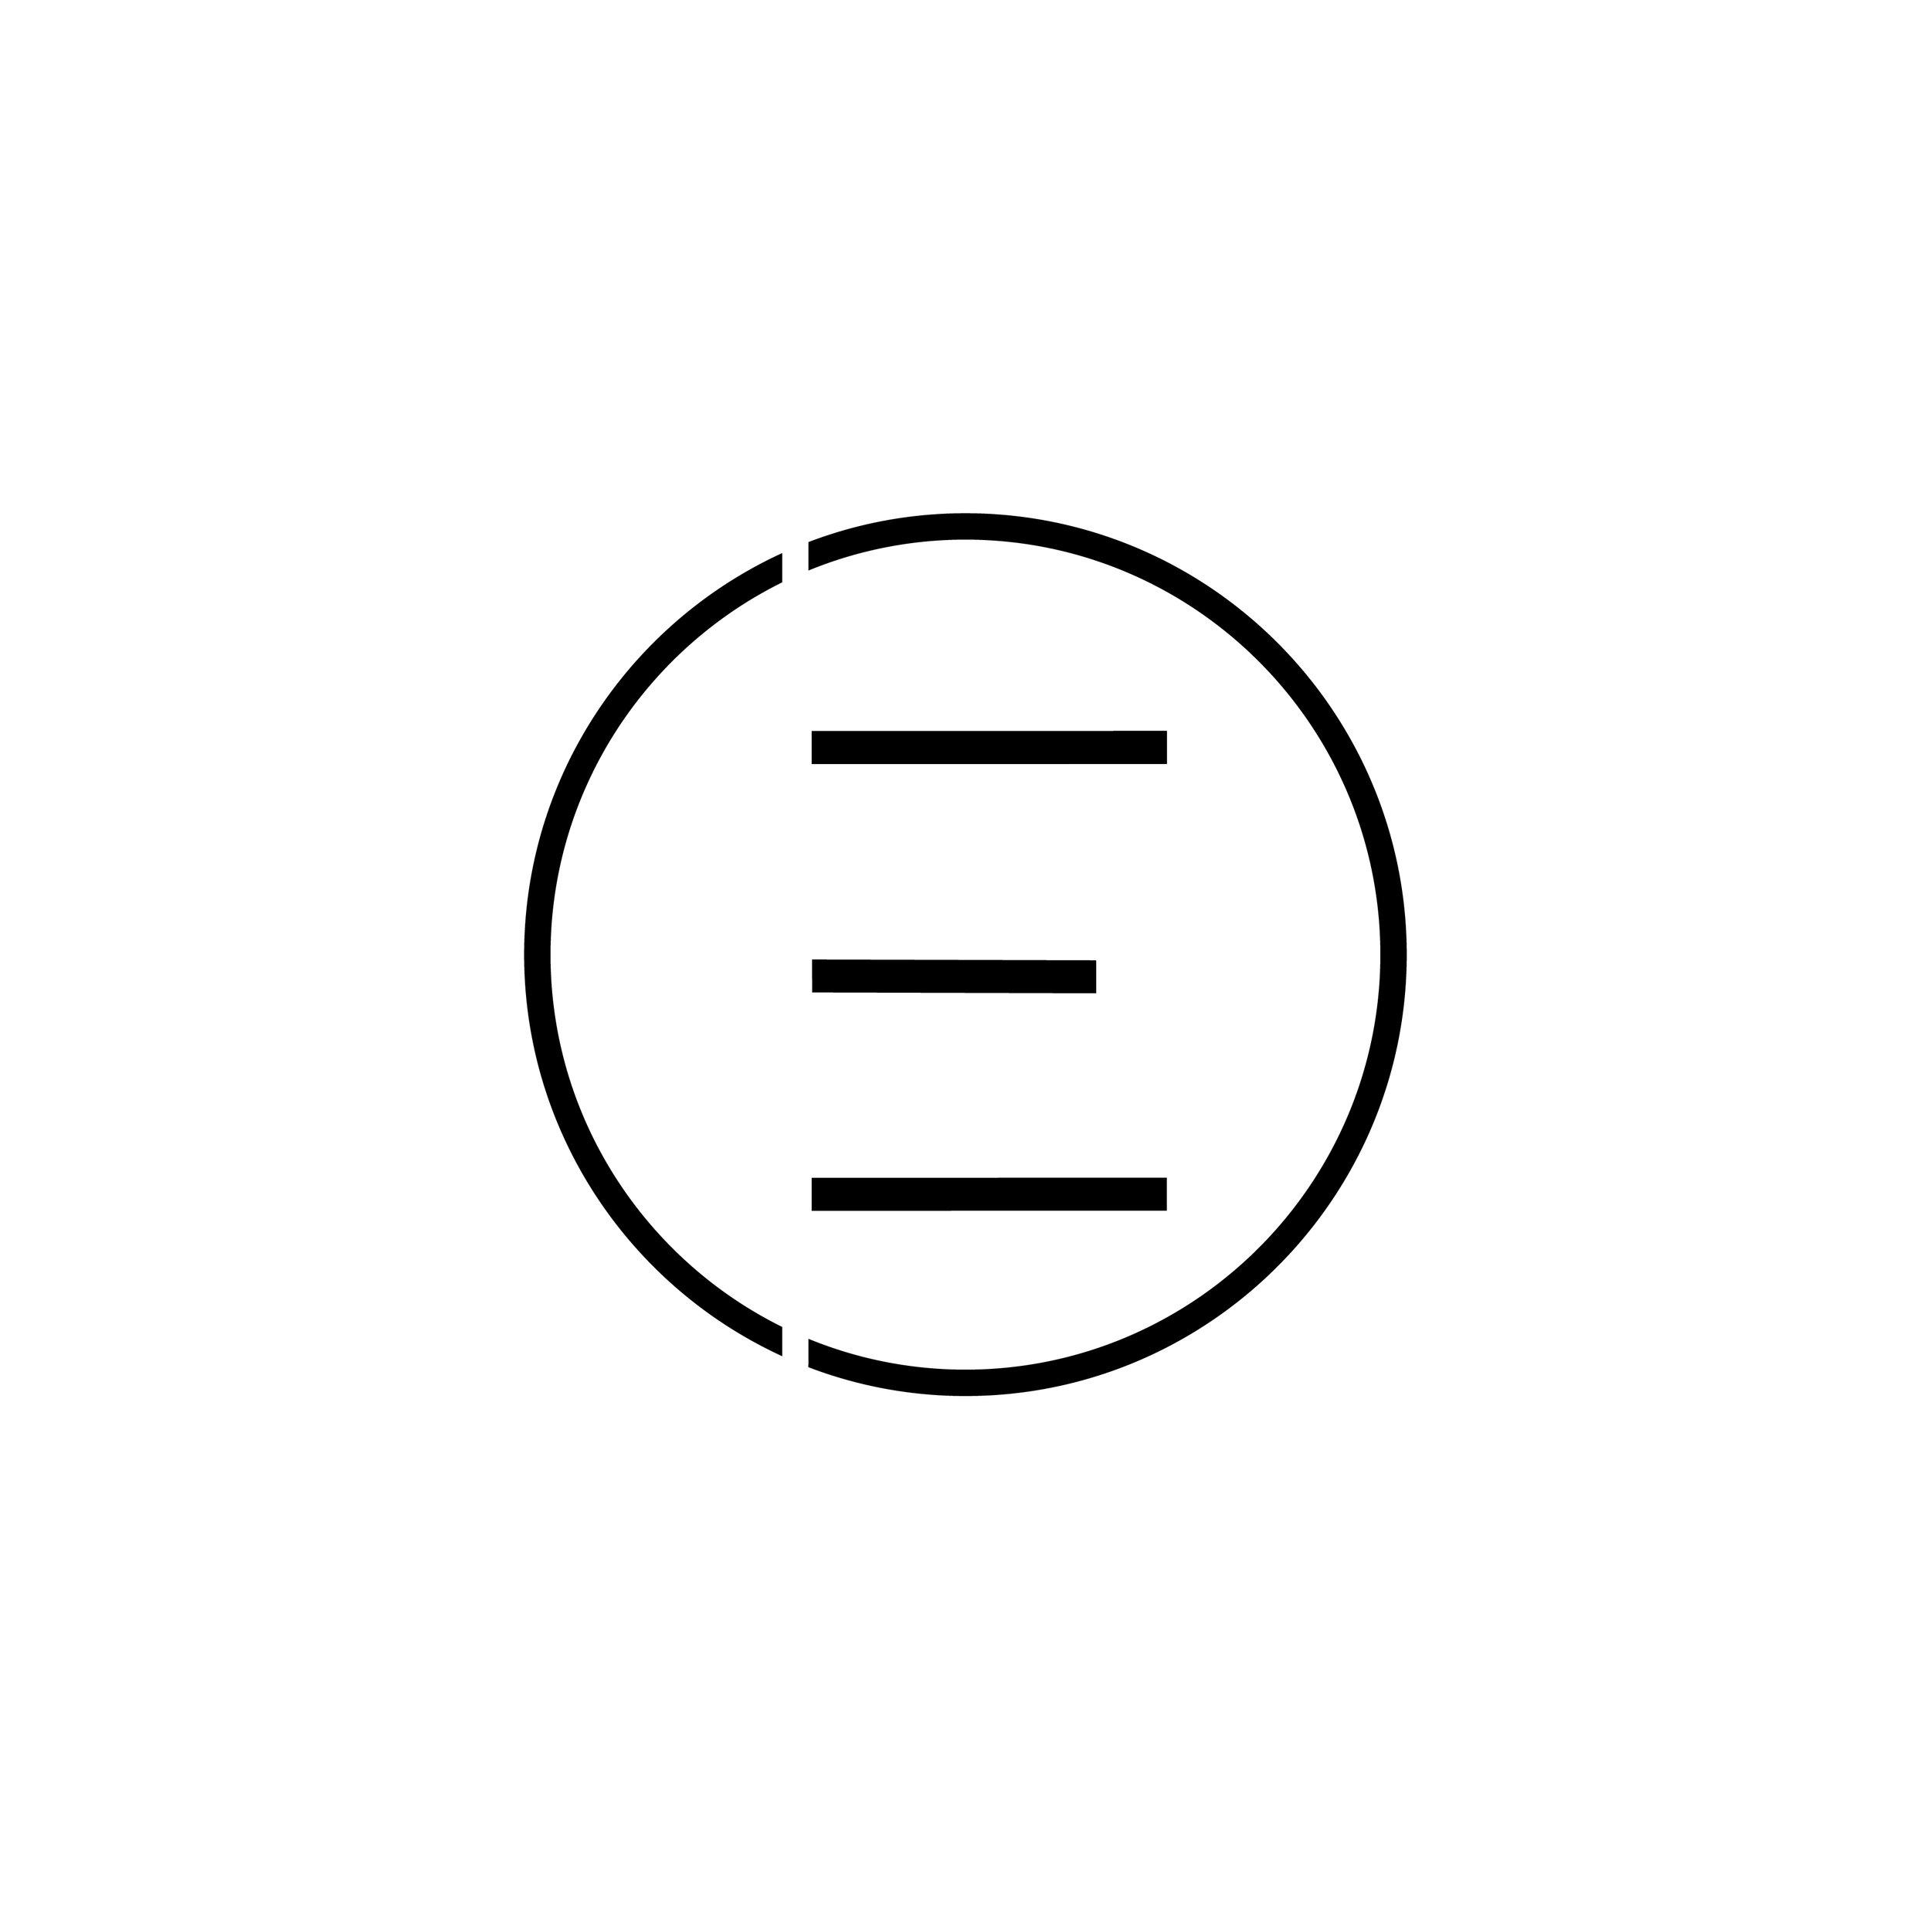 entera_logo_v4_final-03.jpg